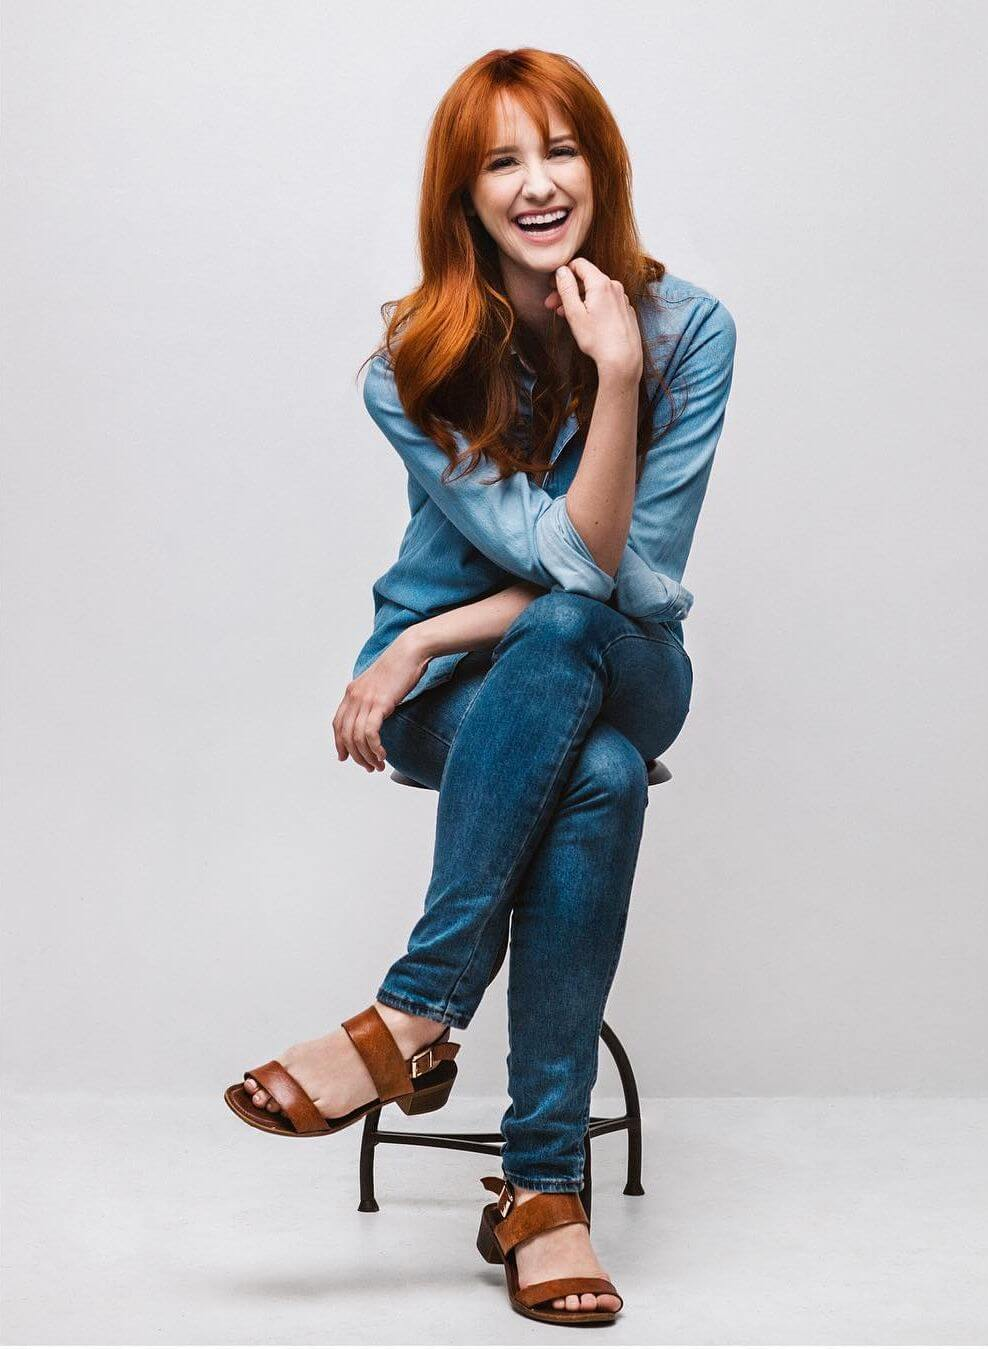 laura spencer smile pics